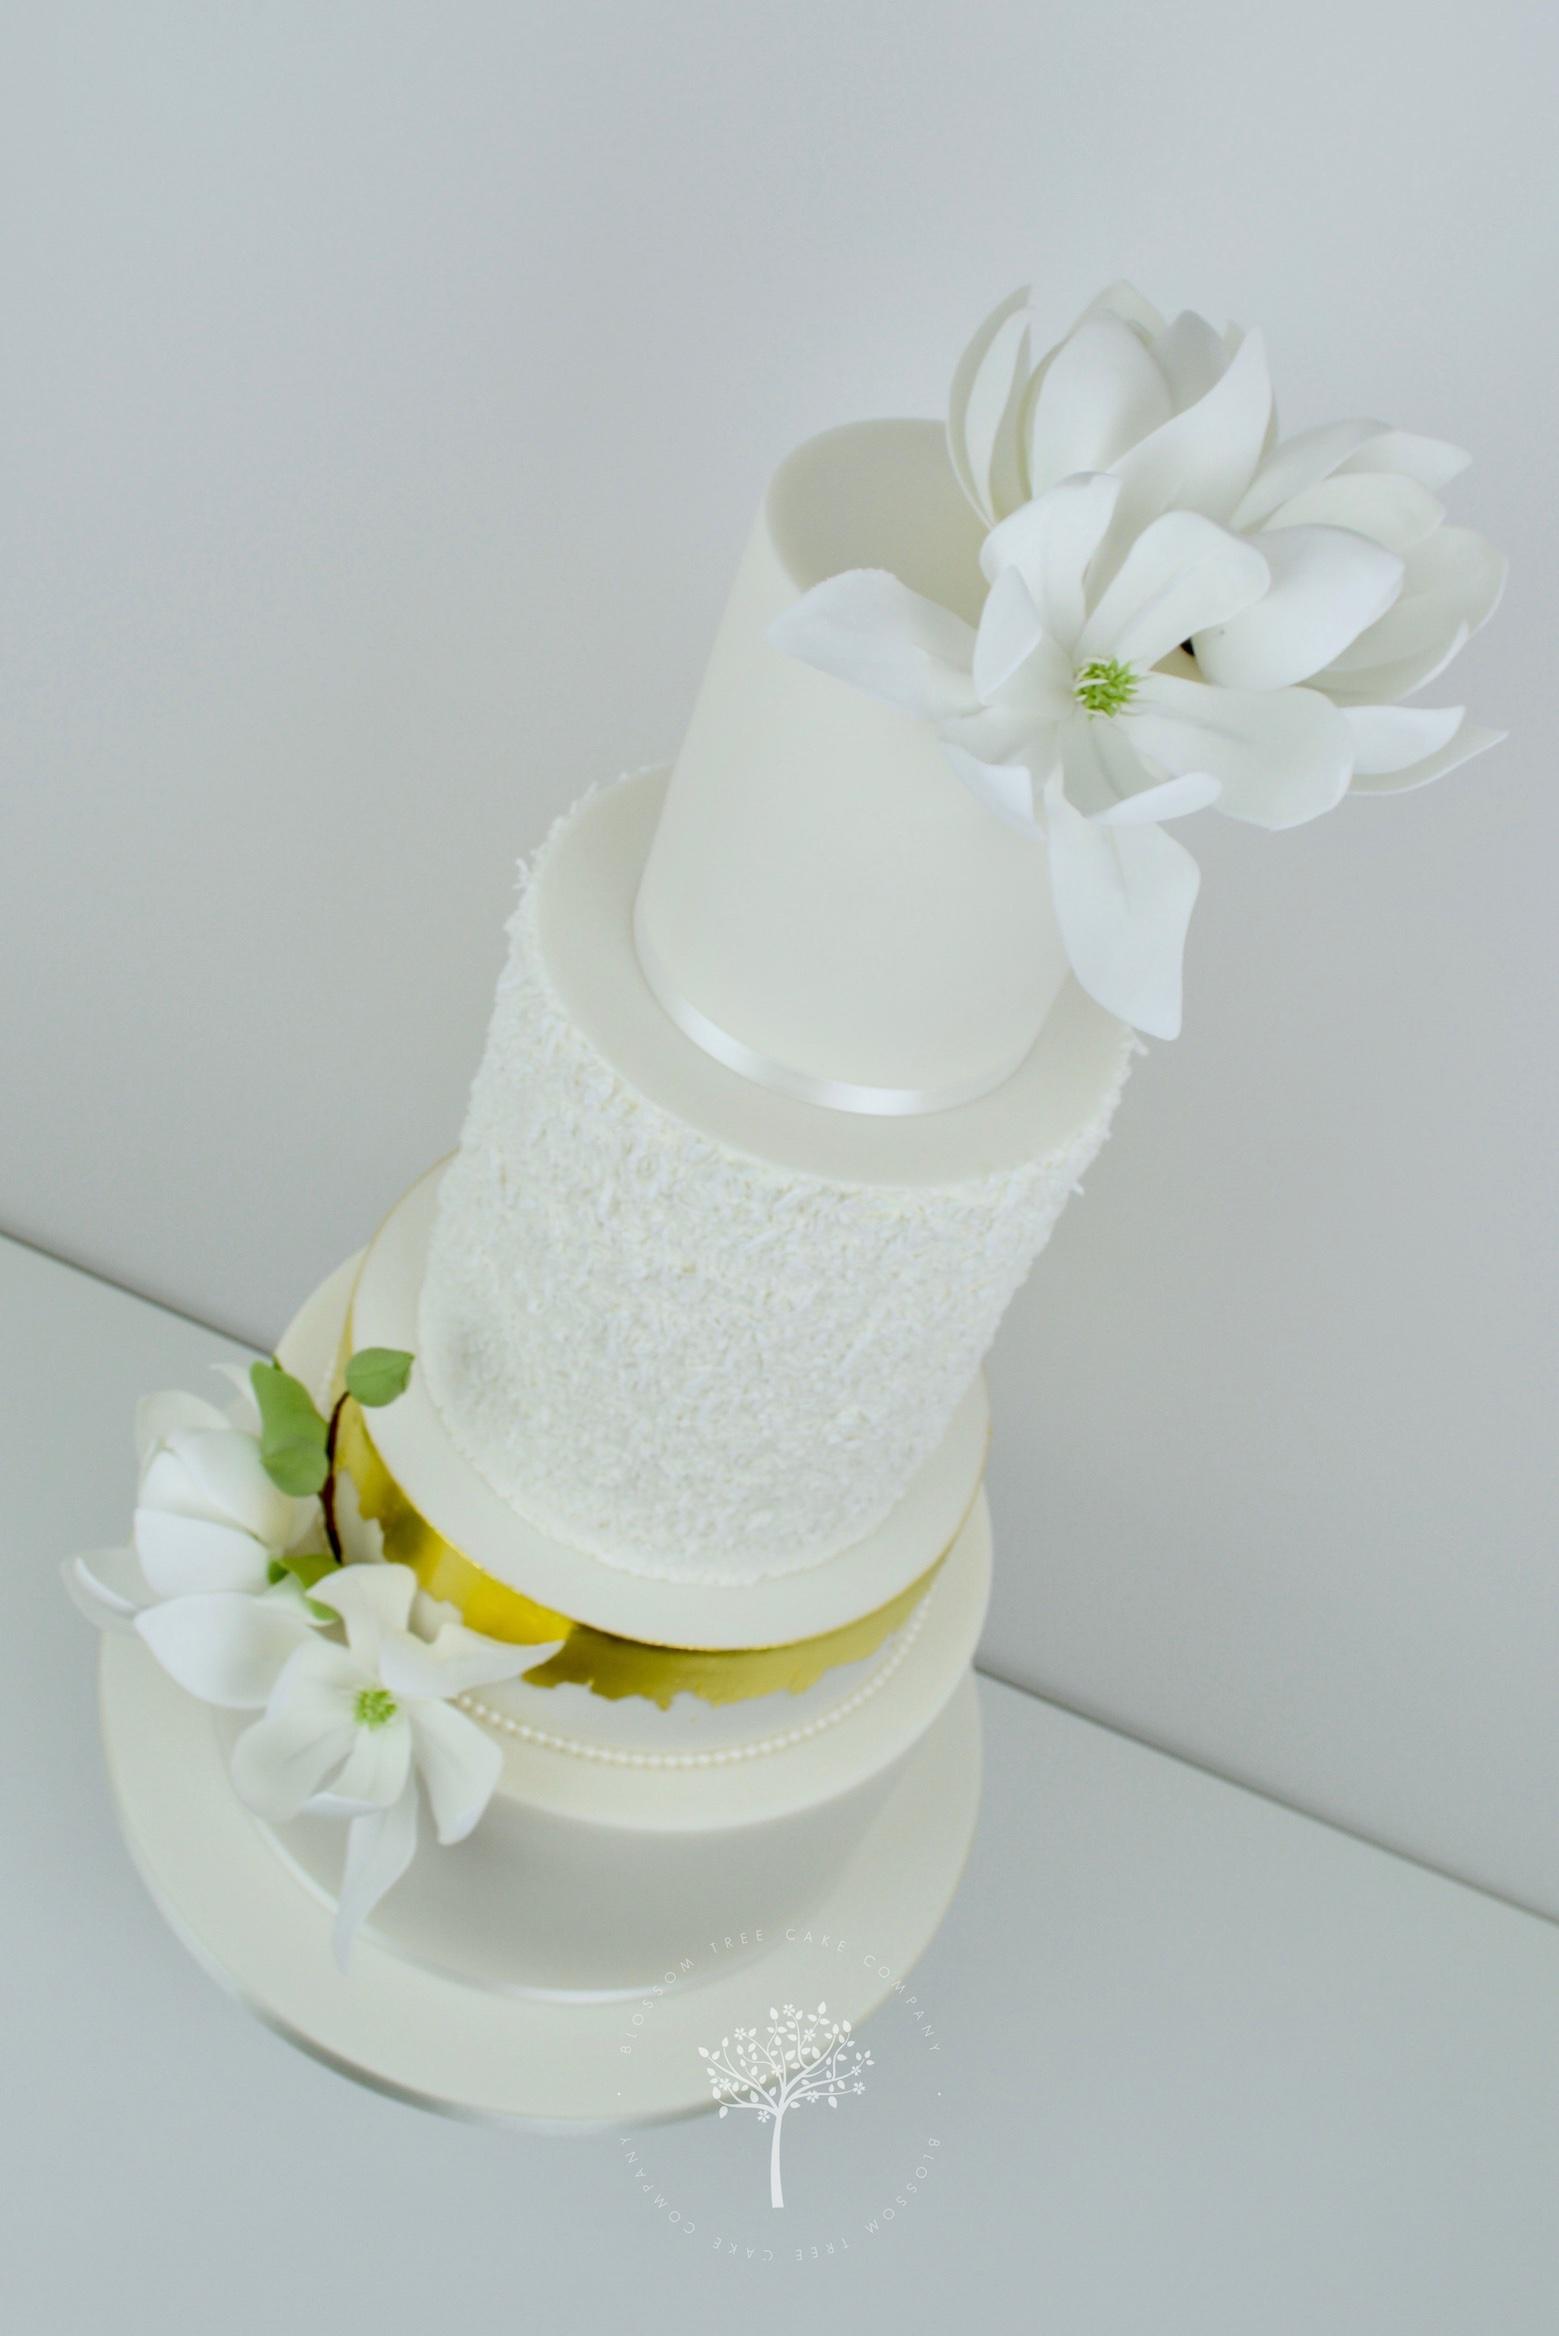 White Magnolias wedding cake by Blossom Tree Cake Company Harrogate North Yorkshire - angle.jpg